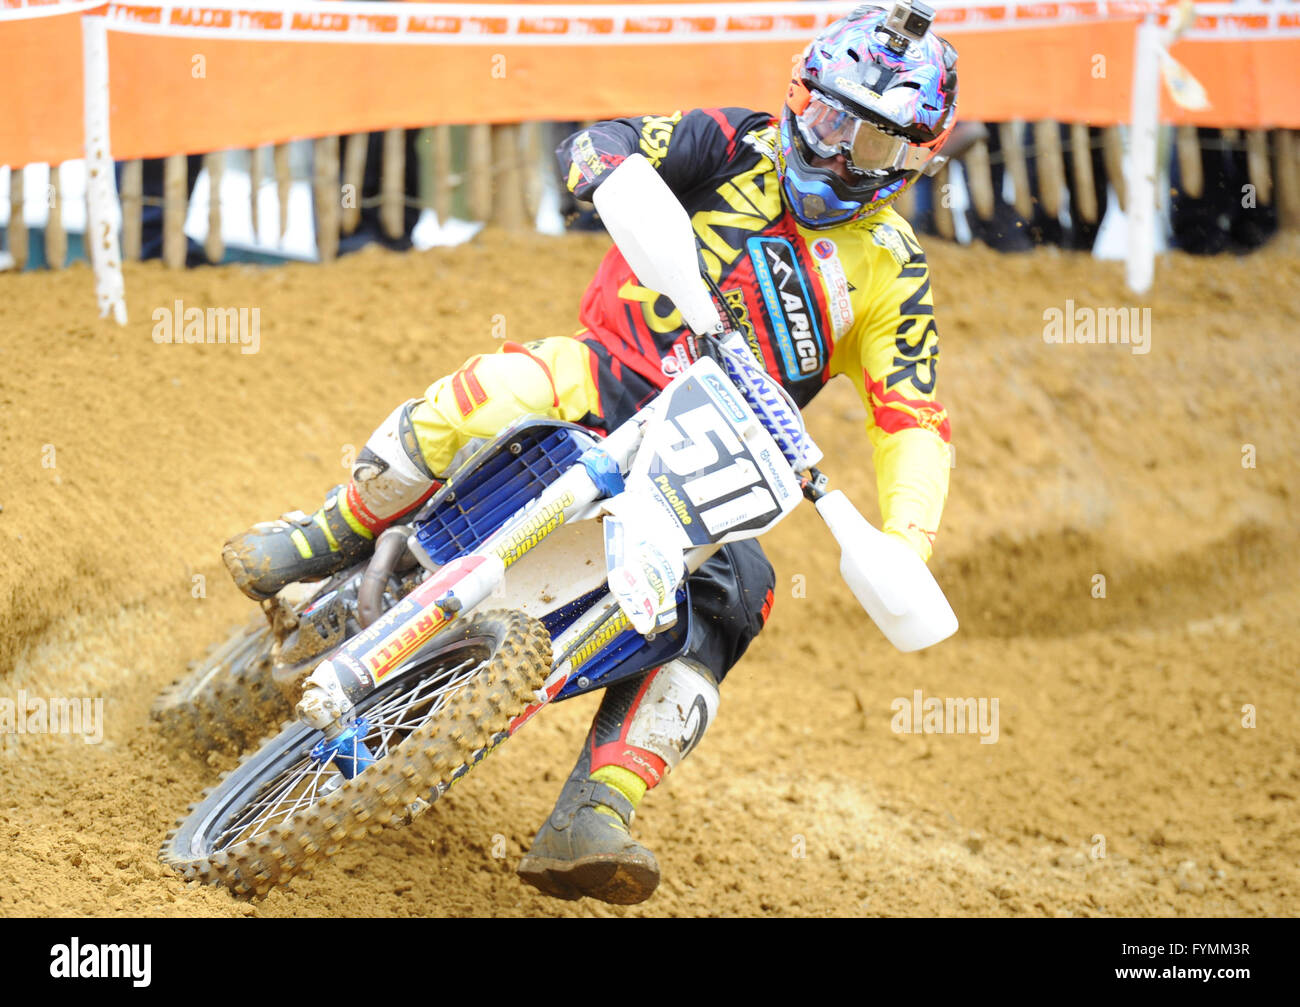 24.04.16 Maxxis British MX Championships. Round 2. Canada Heights, Kent.  Steven Clarke (511) riding the Apico Husqvarna - Stock Image